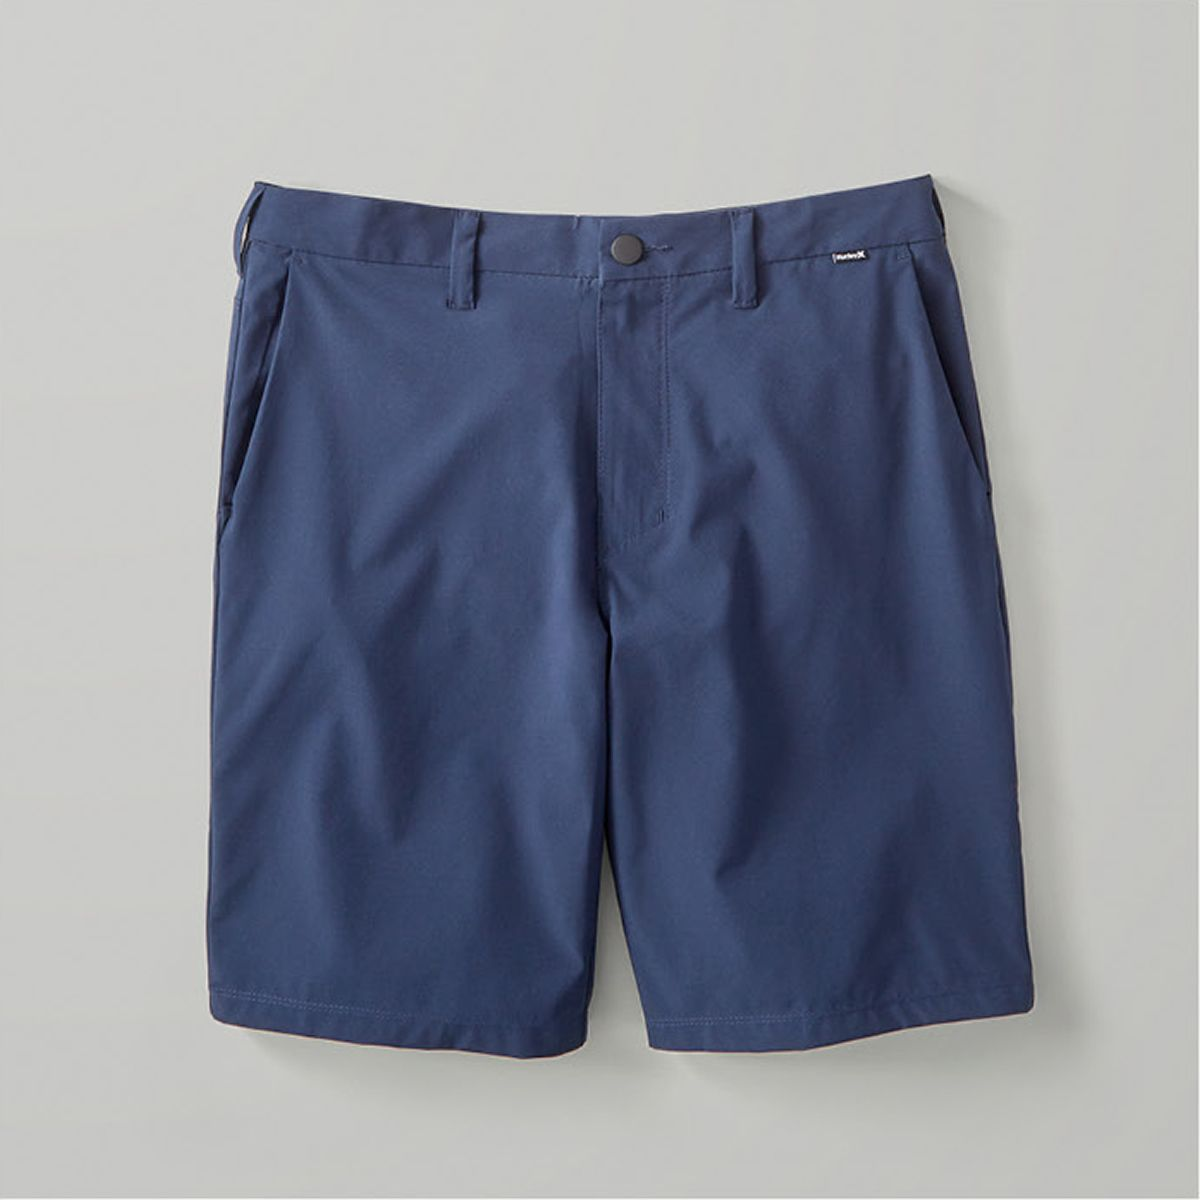 ded86b0de2eb0 Swim Trunk Mens Swimwear   Men s Swim Trunks - Macy s